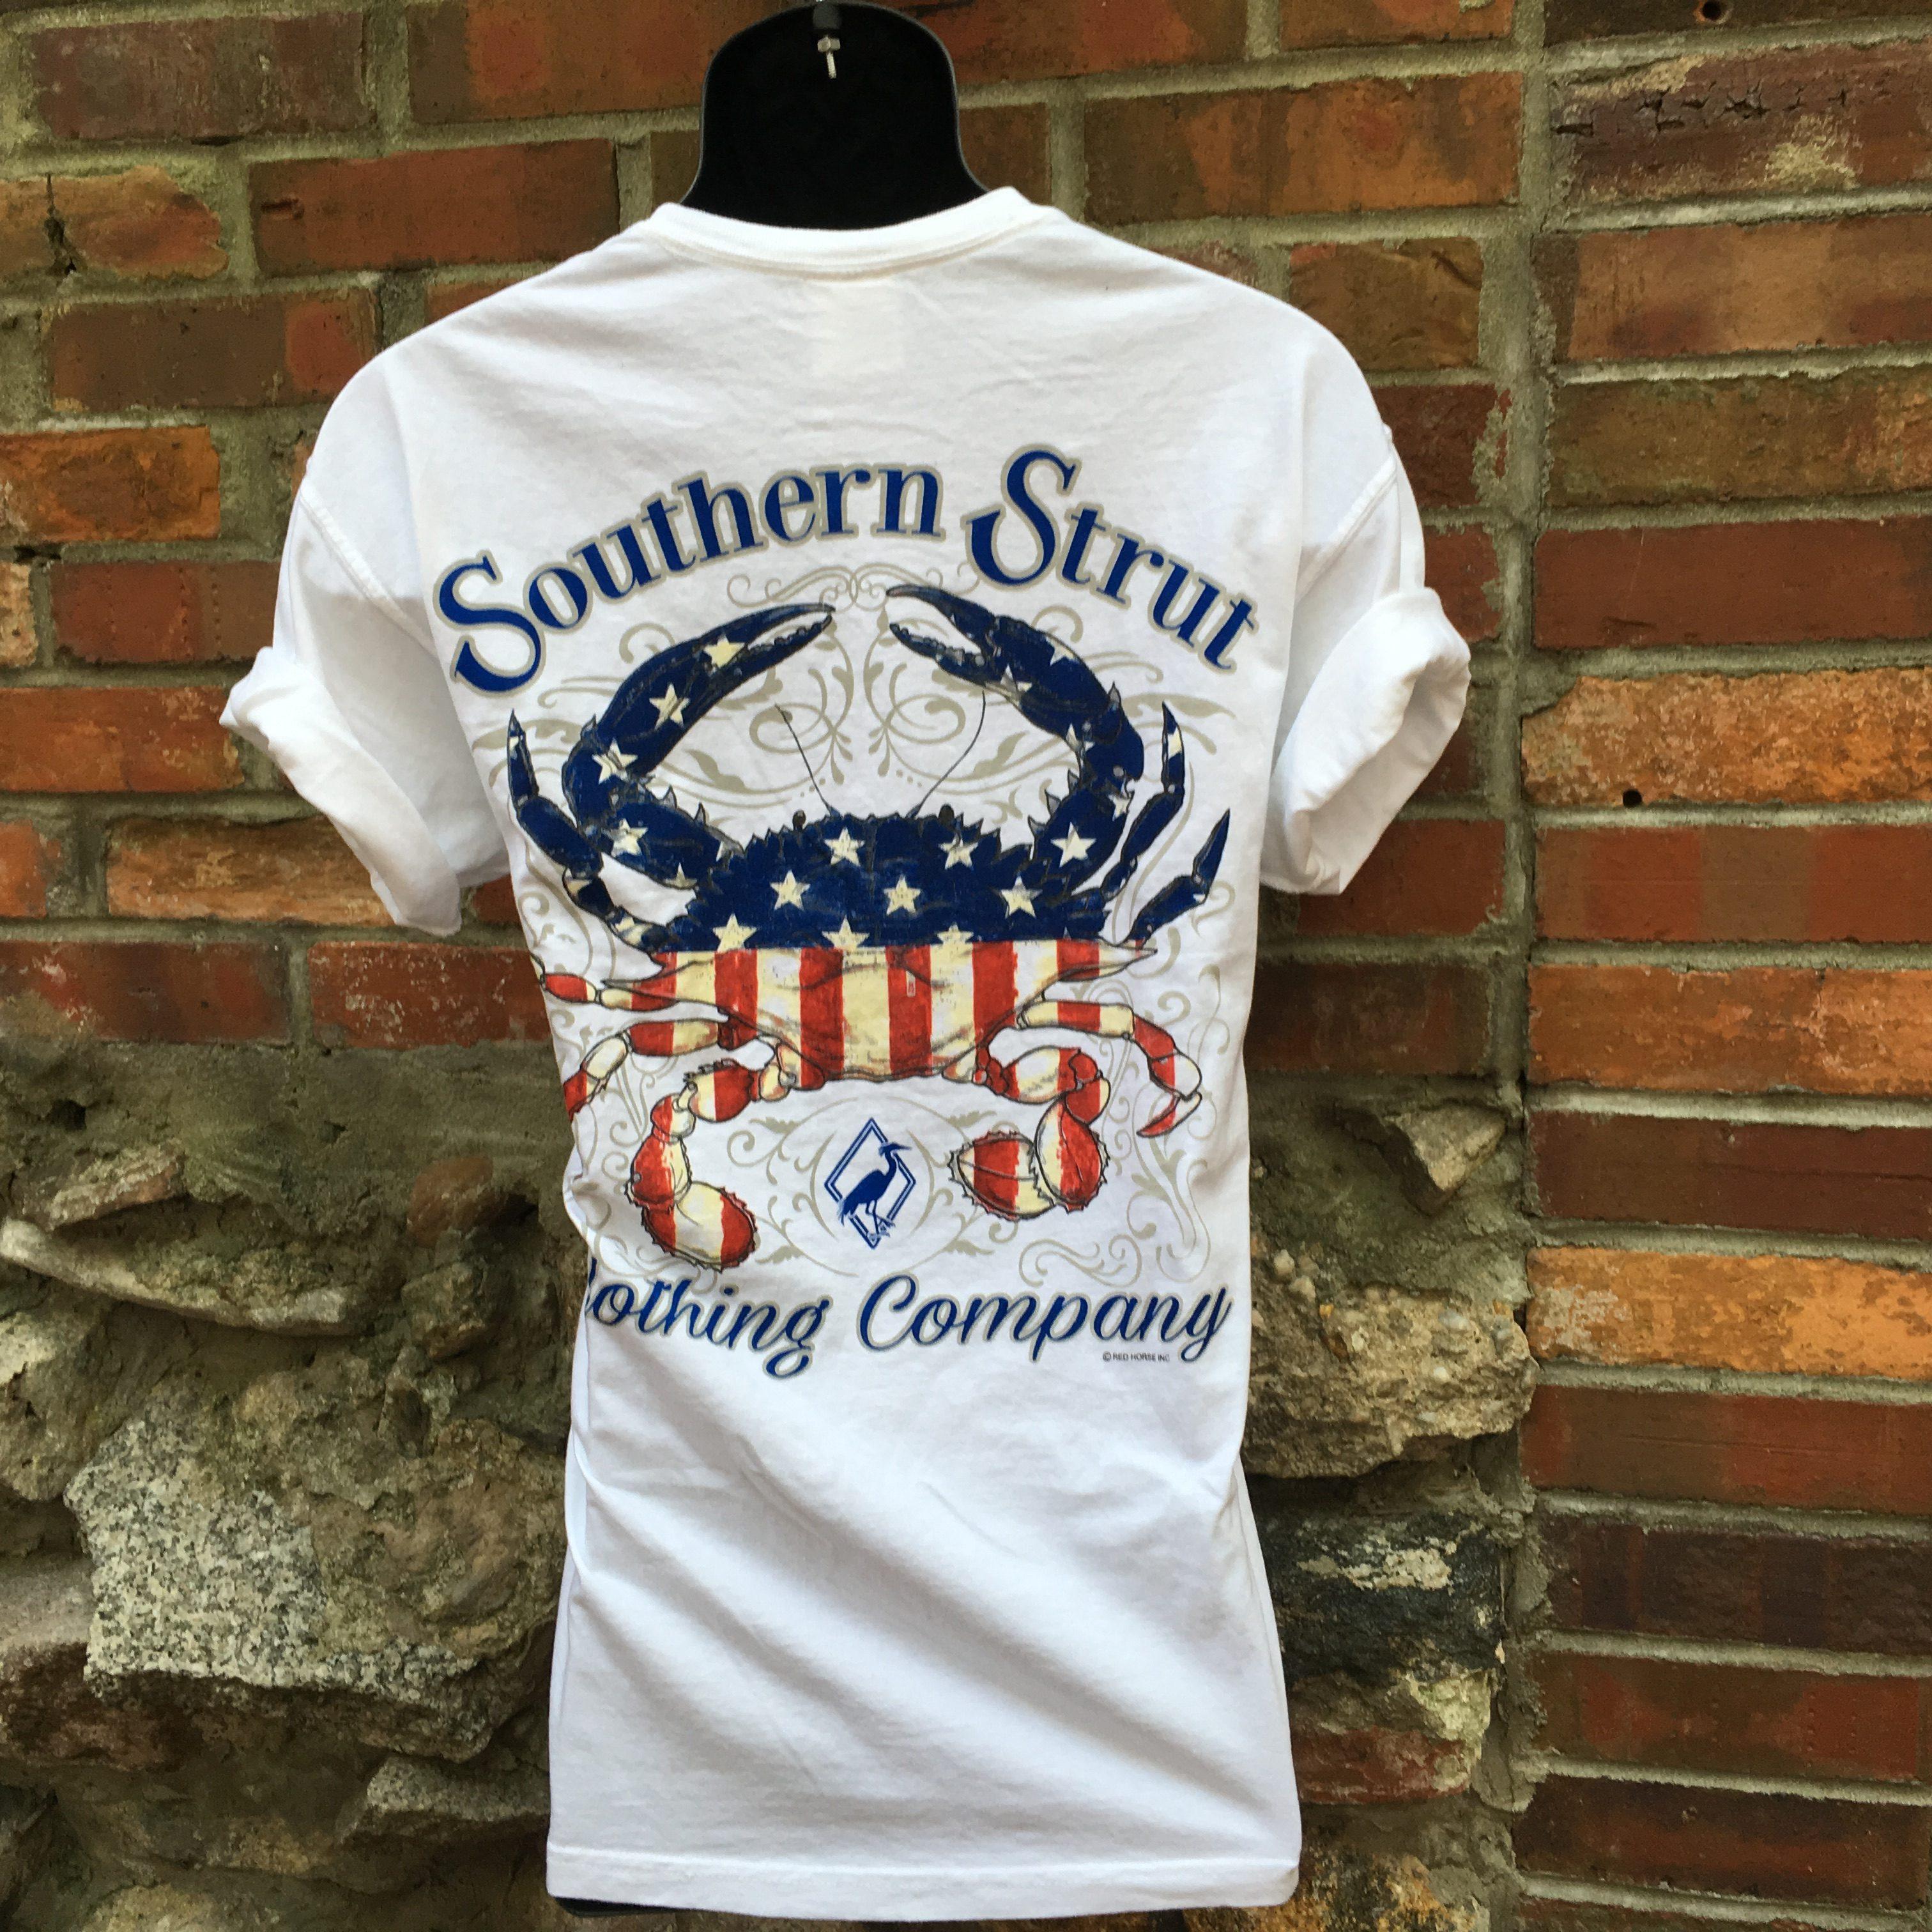 southern t shirt company t shirts design concept